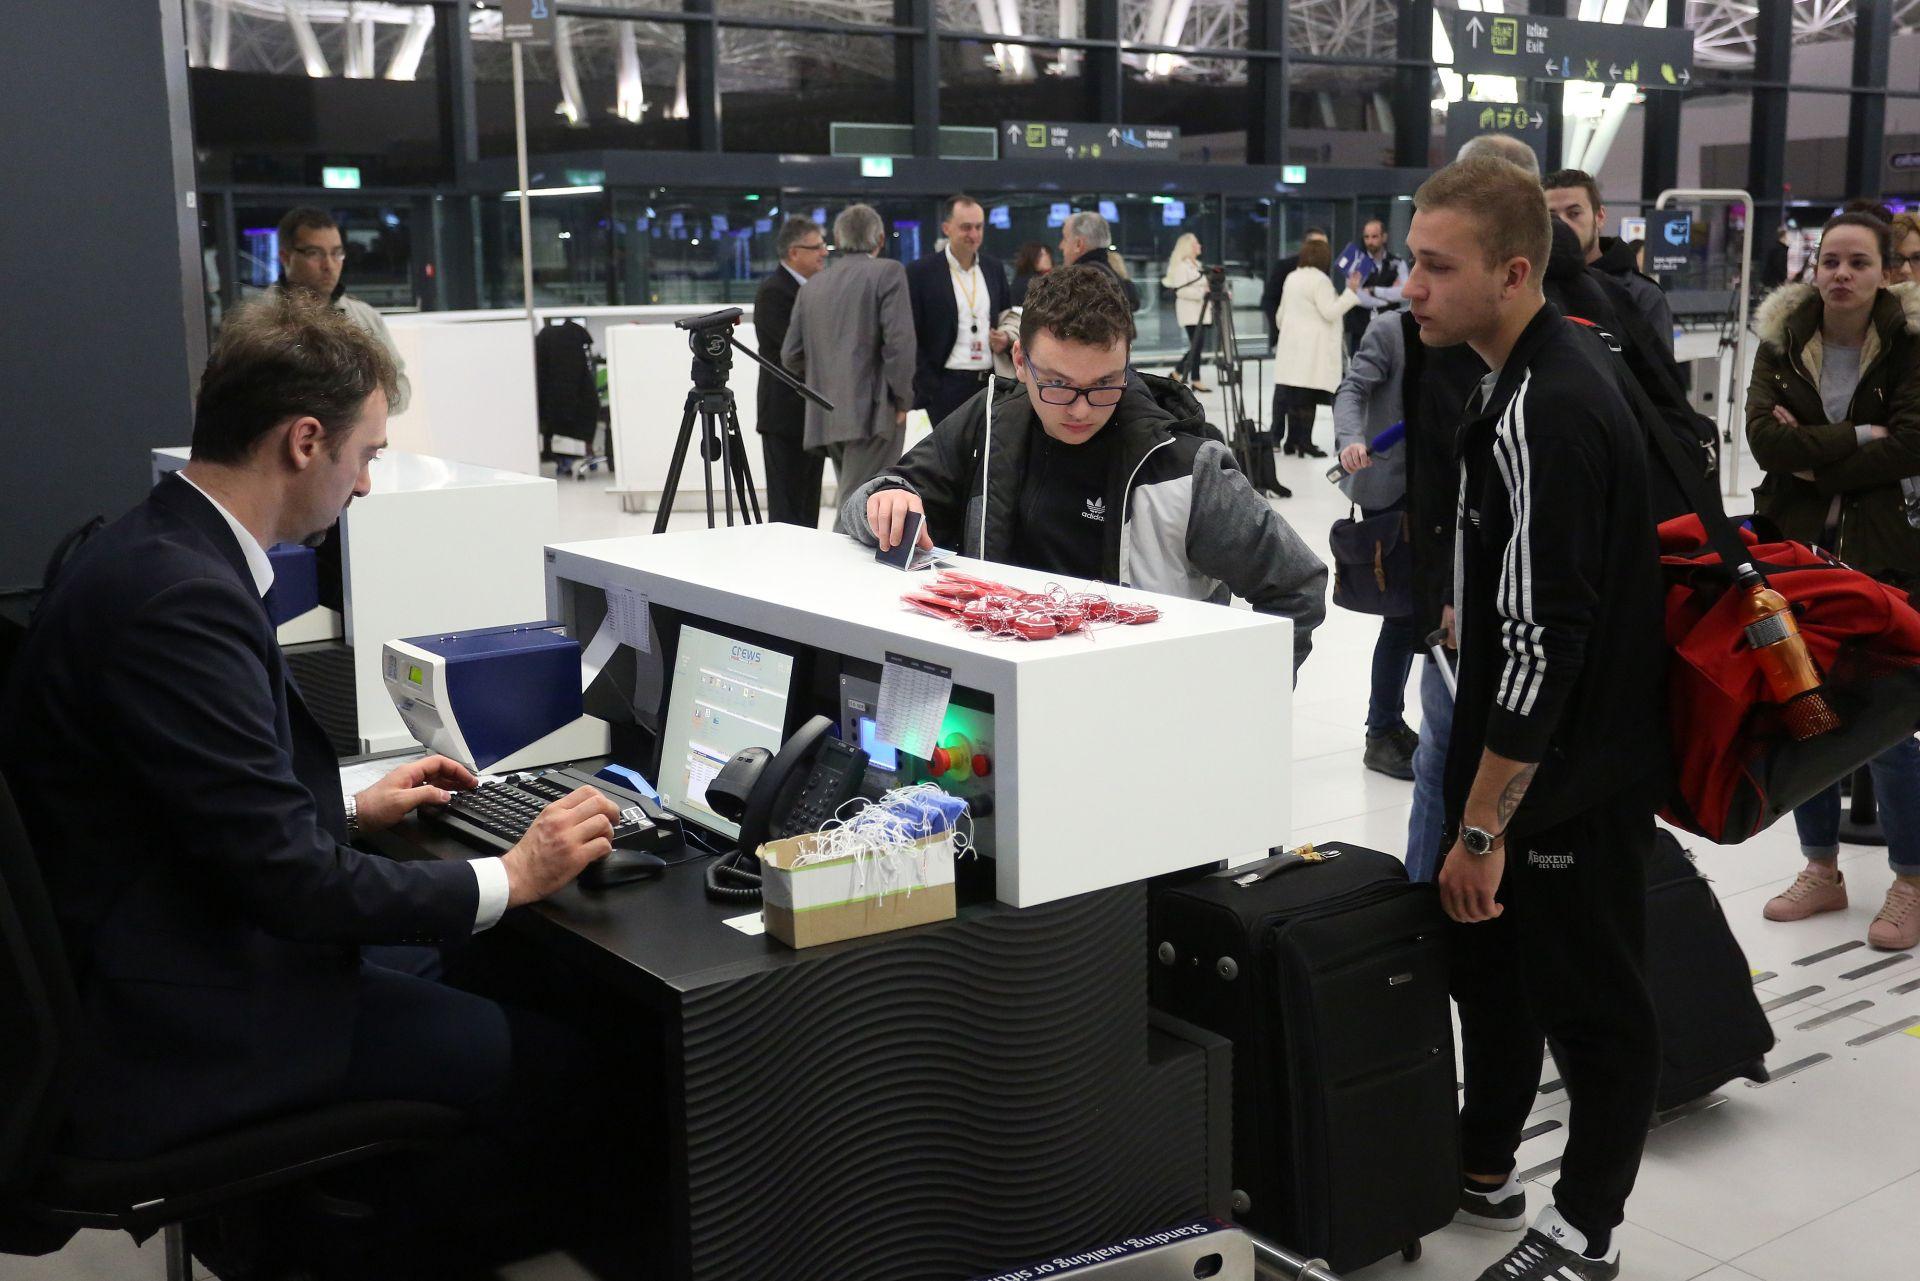 ZAVRŠENA SVA TESTIRANJA: Novi terminal Zračne luke Franjo Tuđman počeo s radom